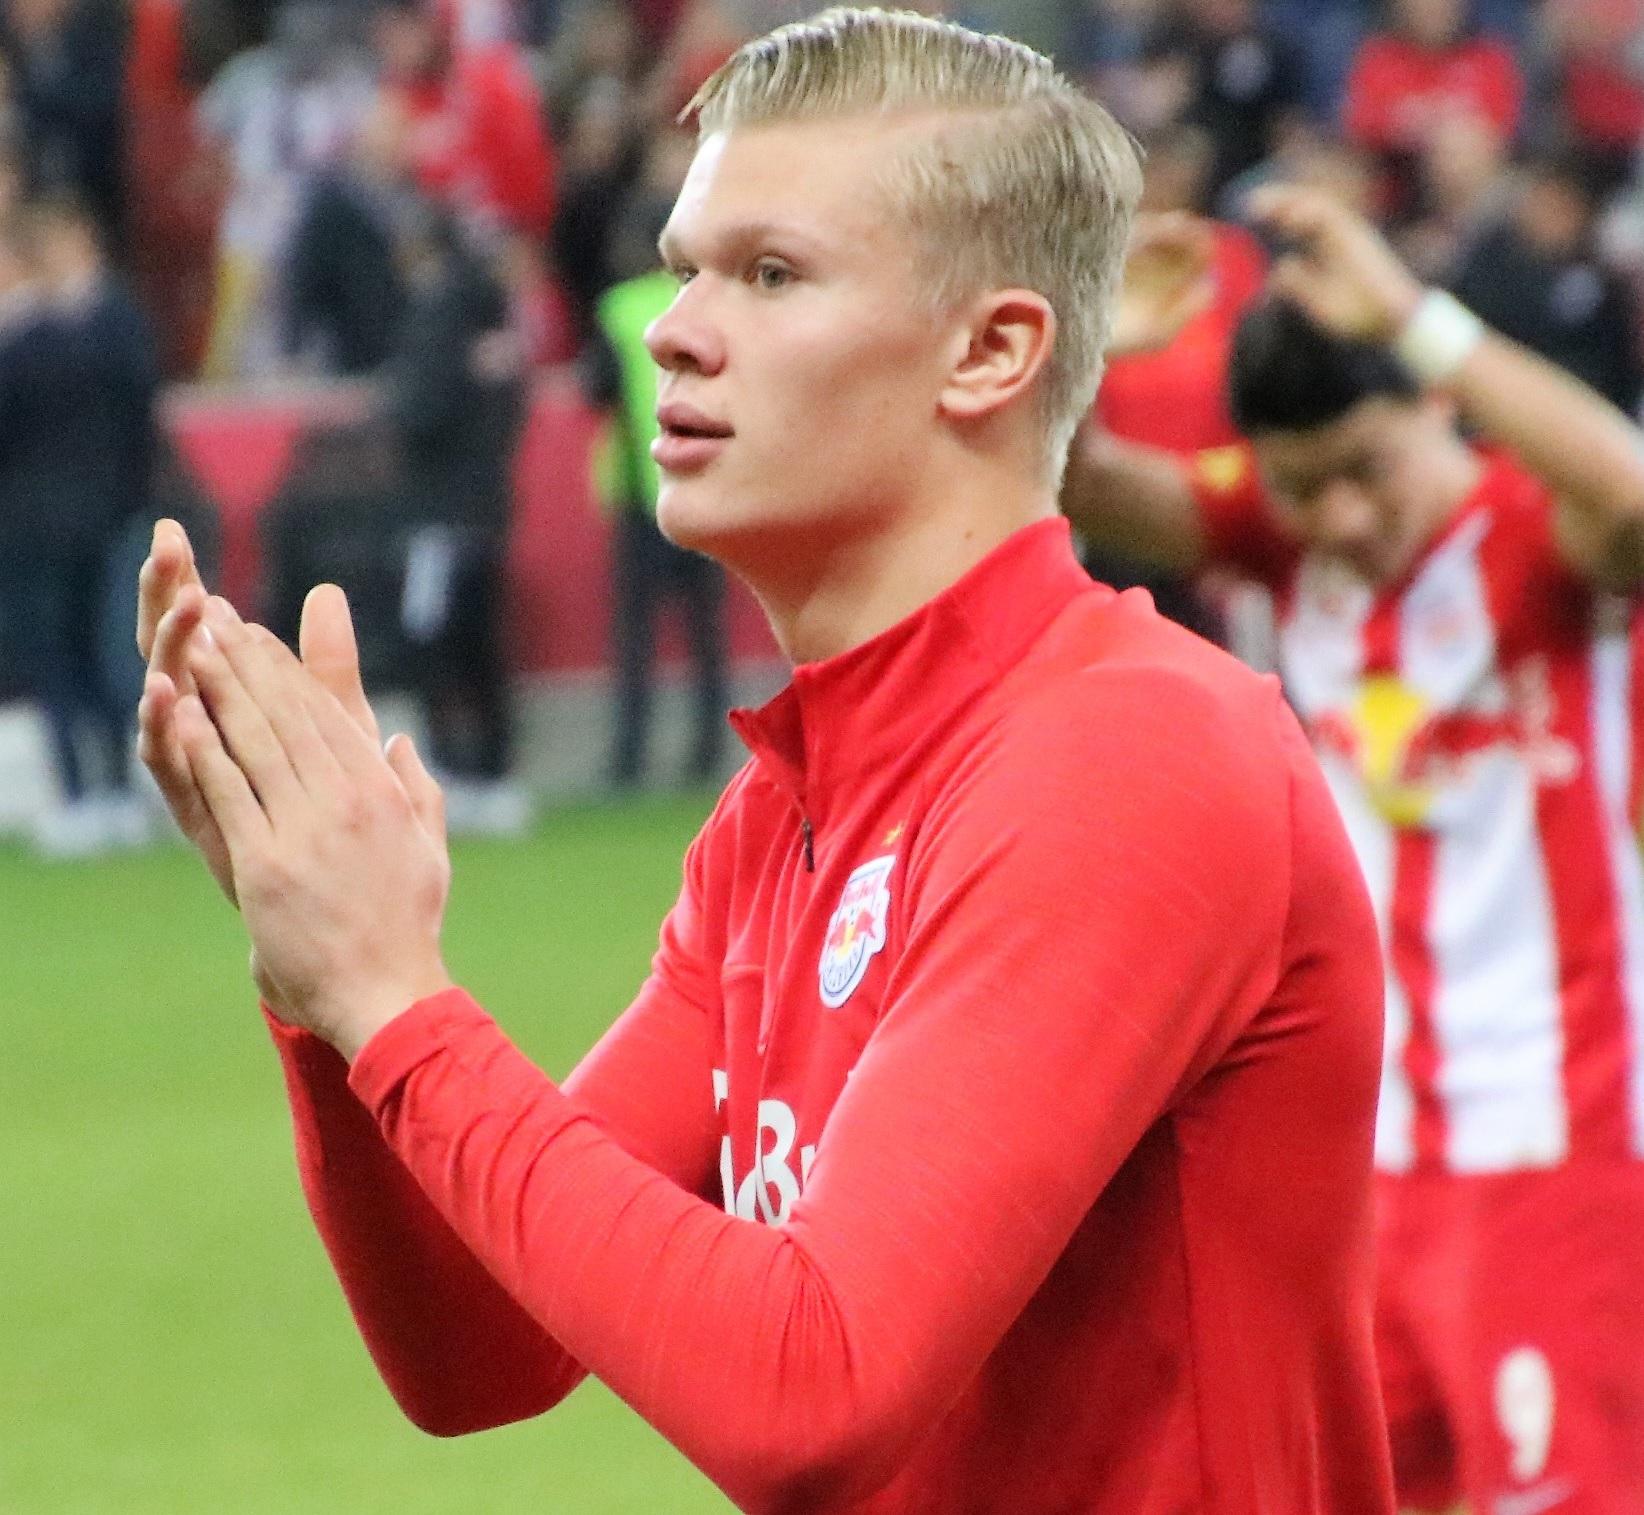 Haaland Nets Hat Trick In Debut As Dortmund Beat Augsburg In Eight Goal Thriller